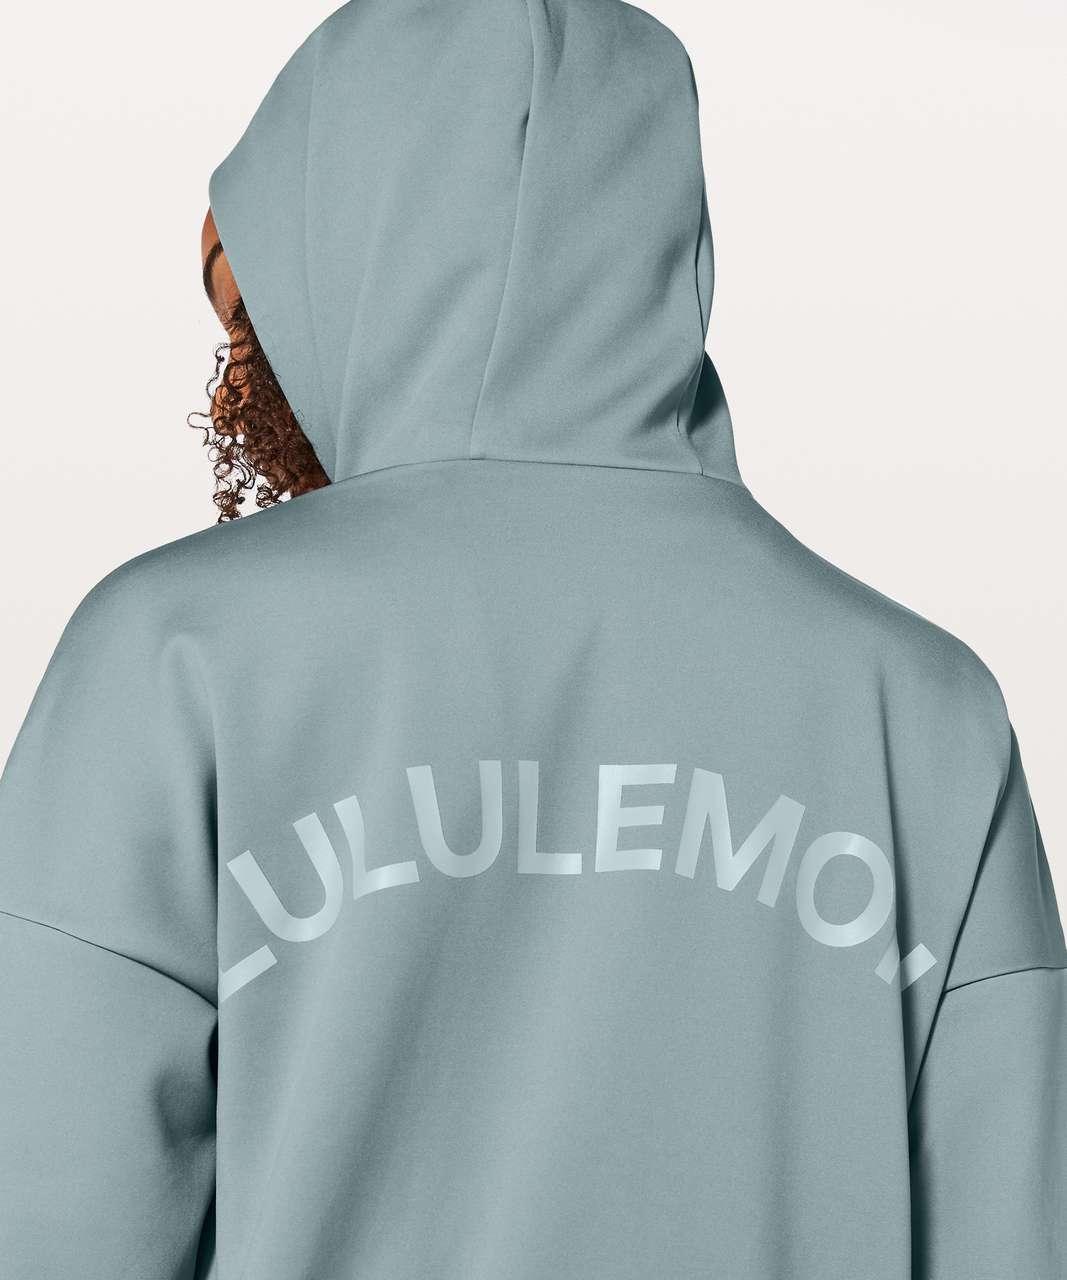 Lululemon Shaped Jacket Expression - Sterling